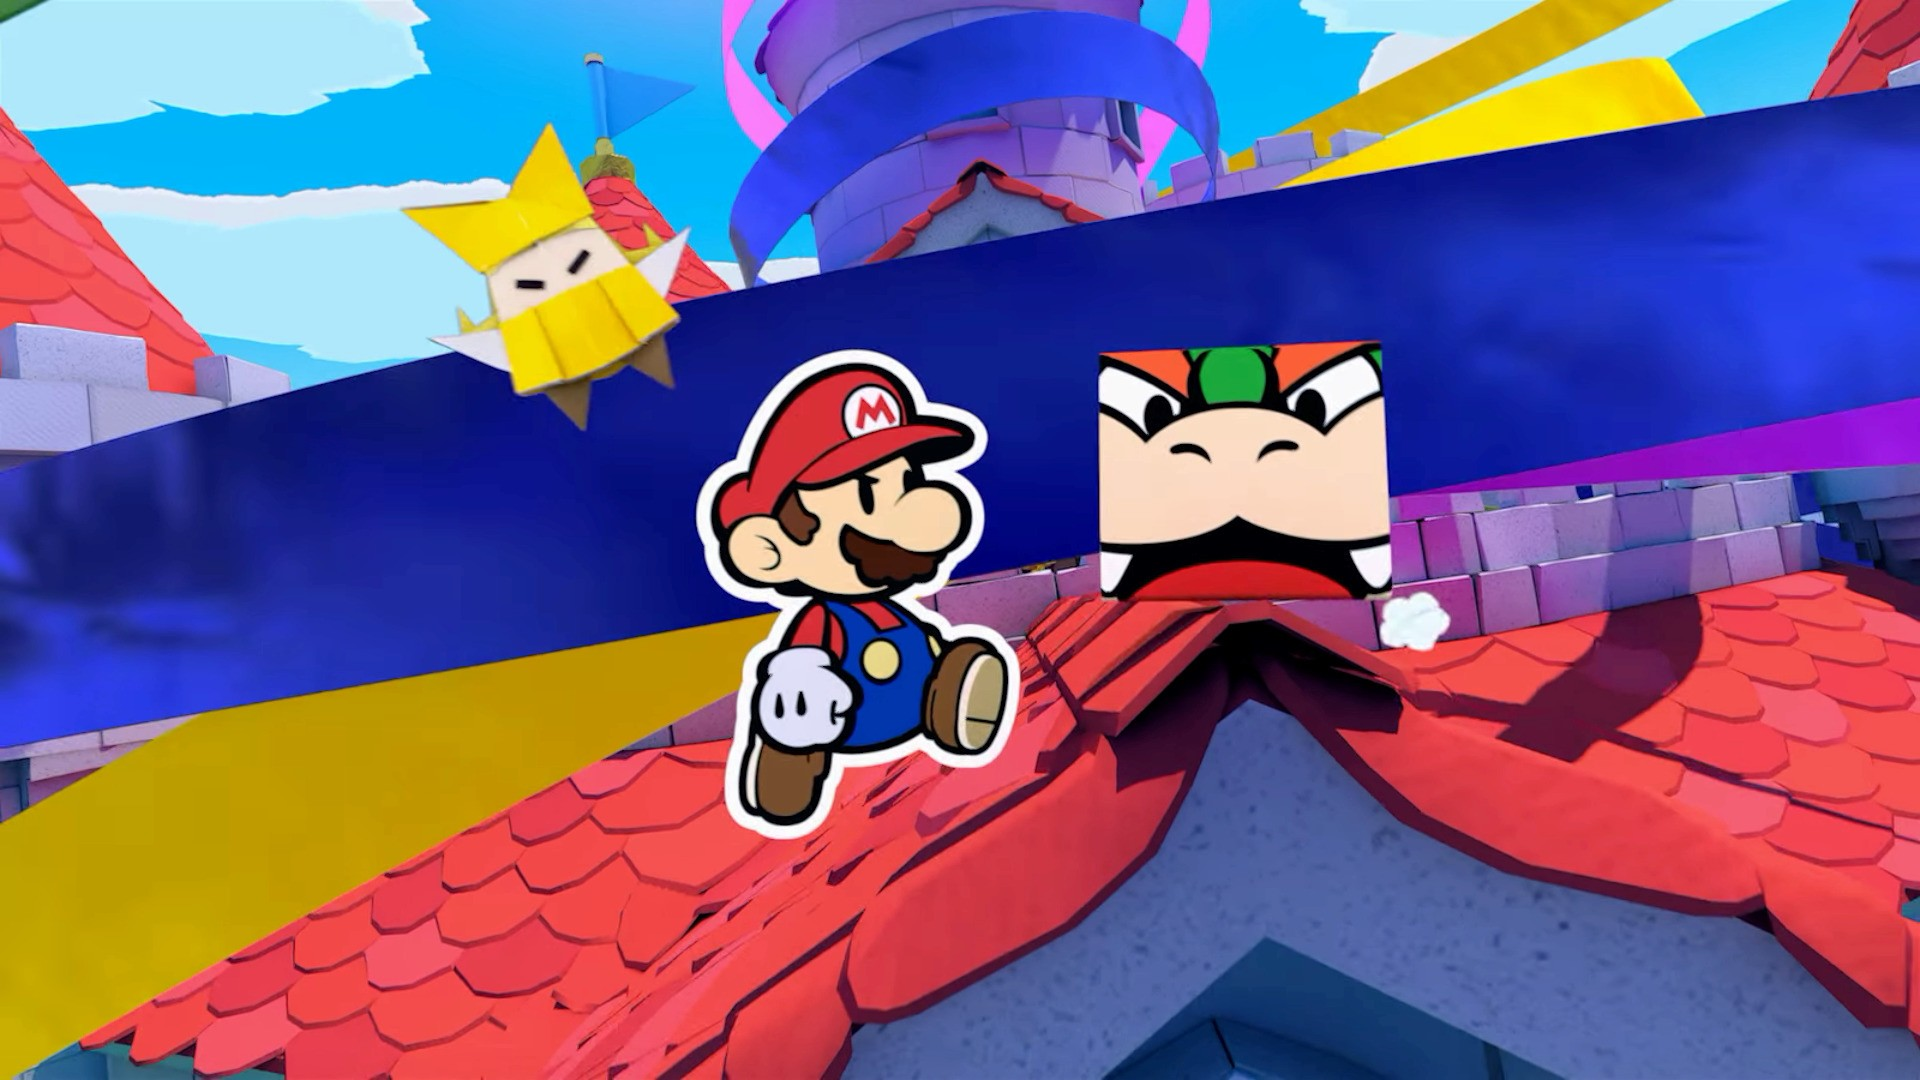 Paper-Mario-Origami-King-Switch-NintendOn